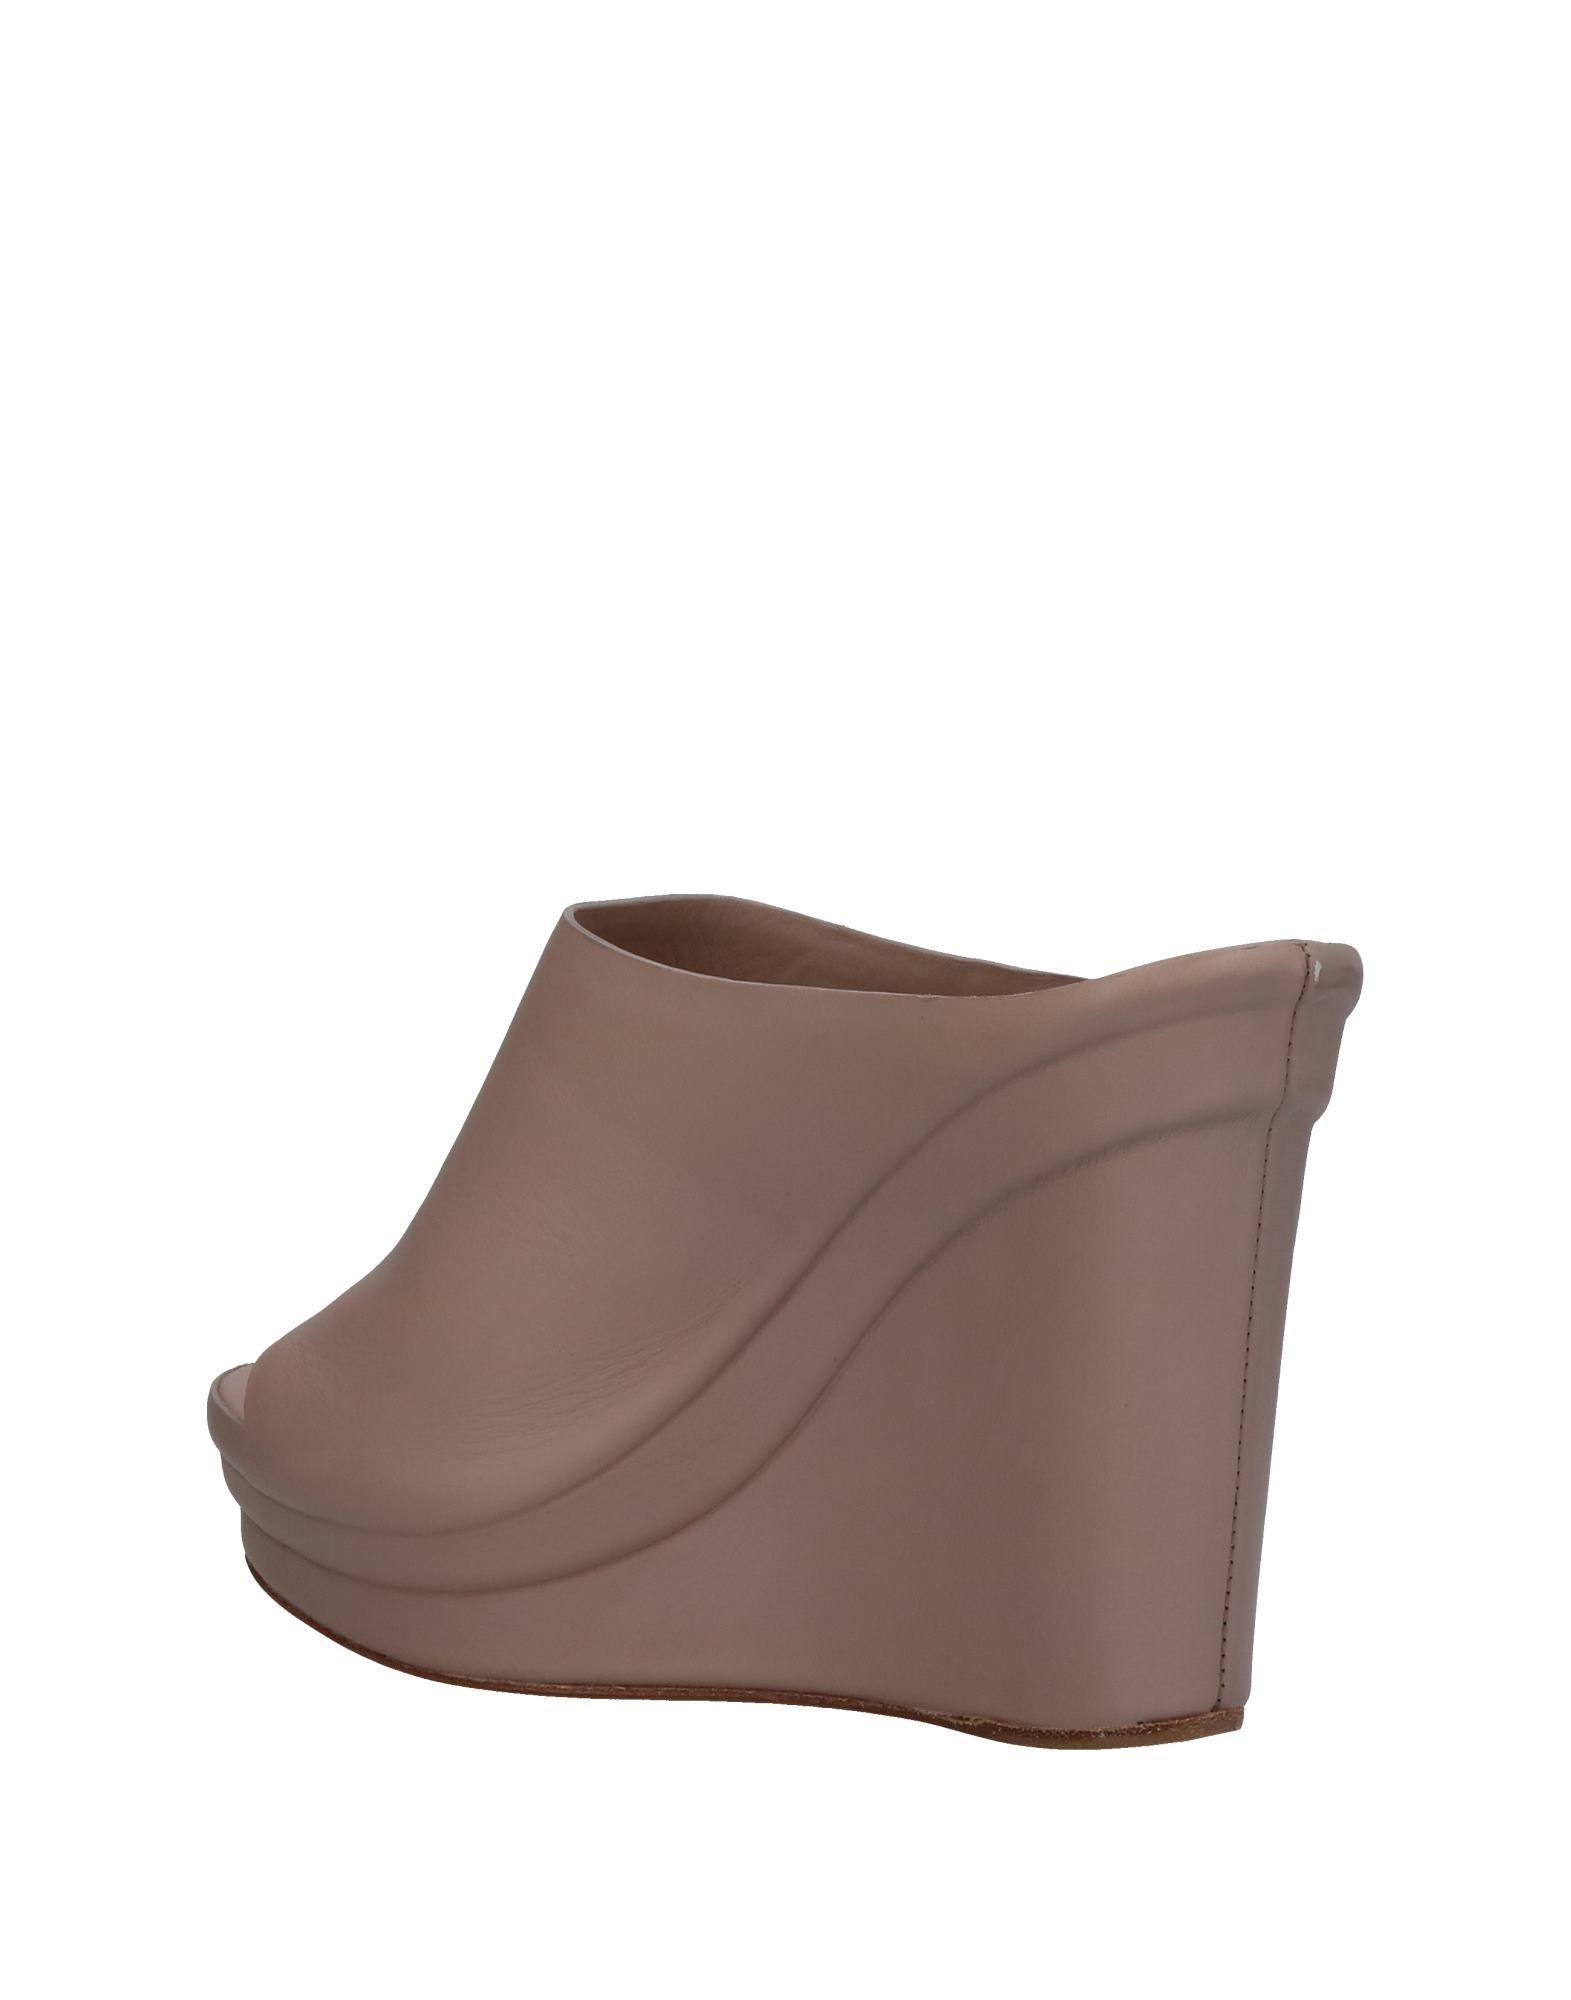 Roberto Del Carlo Gute Sandalen Damen  11186380MM Gute Carlo Qualität beliebte Schuhe f39a11